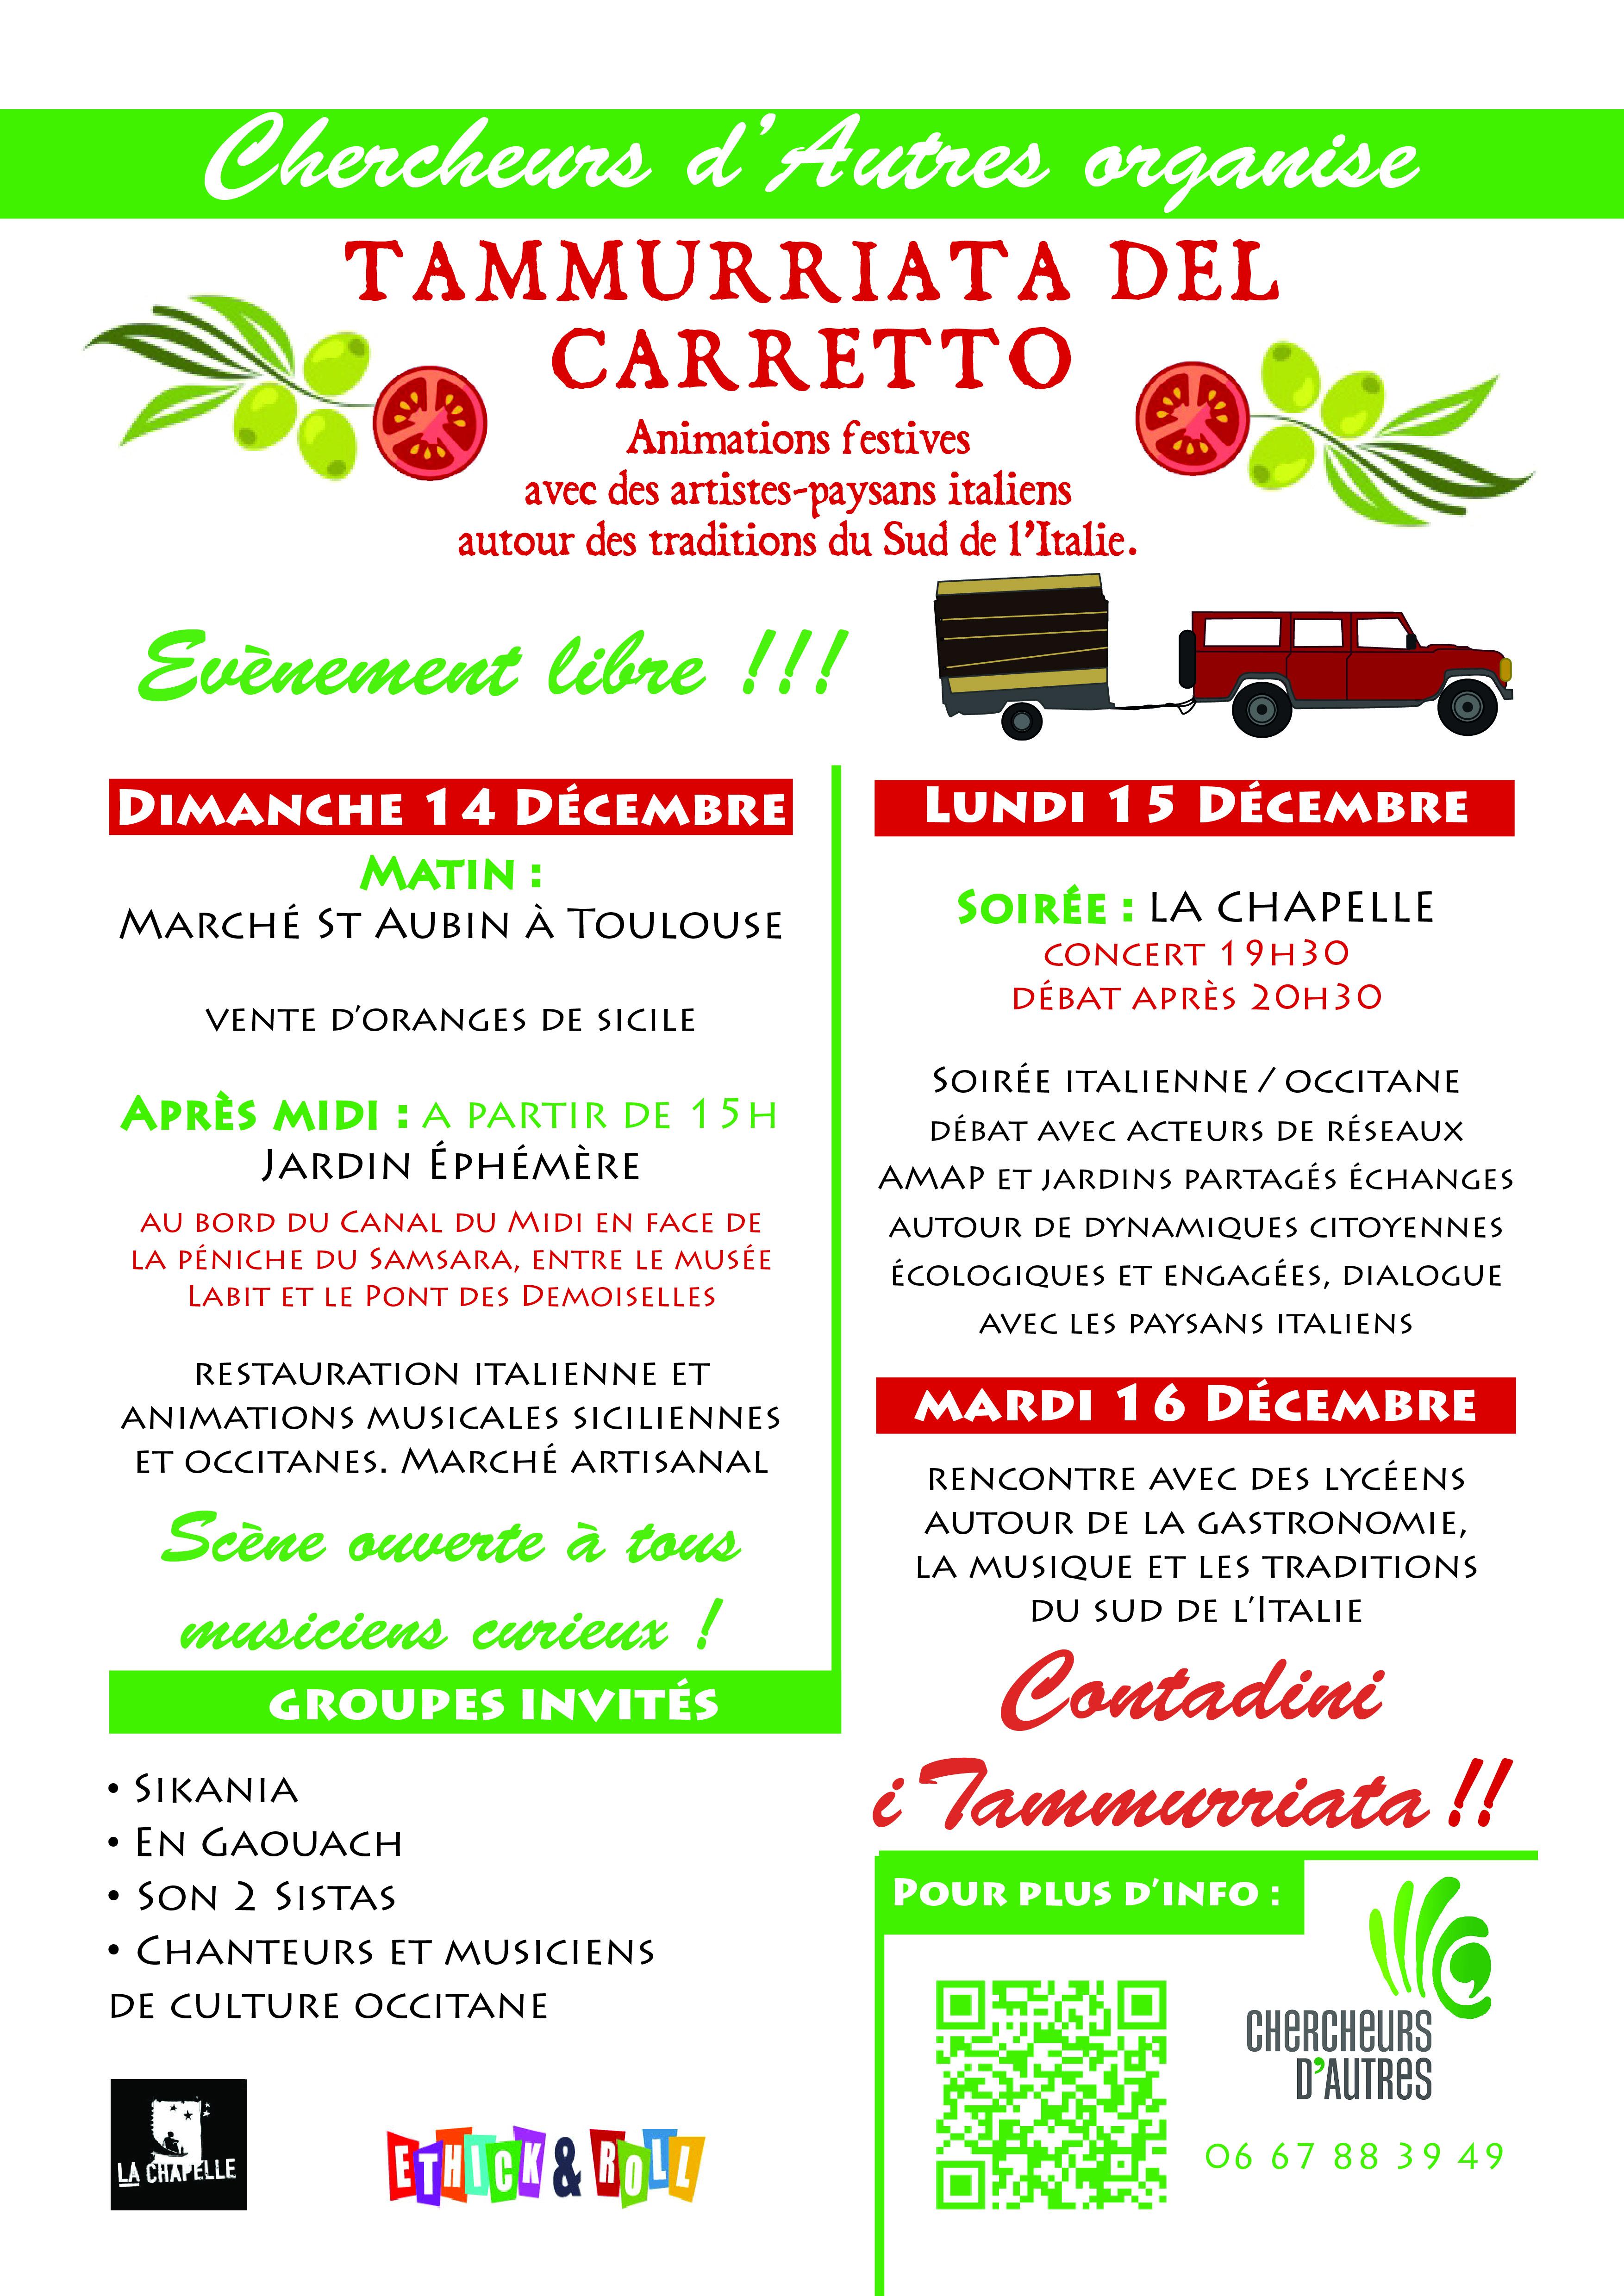 Rencontre Tummurriate del Carretto 14,15,16 décembre 2014 à Toulouse